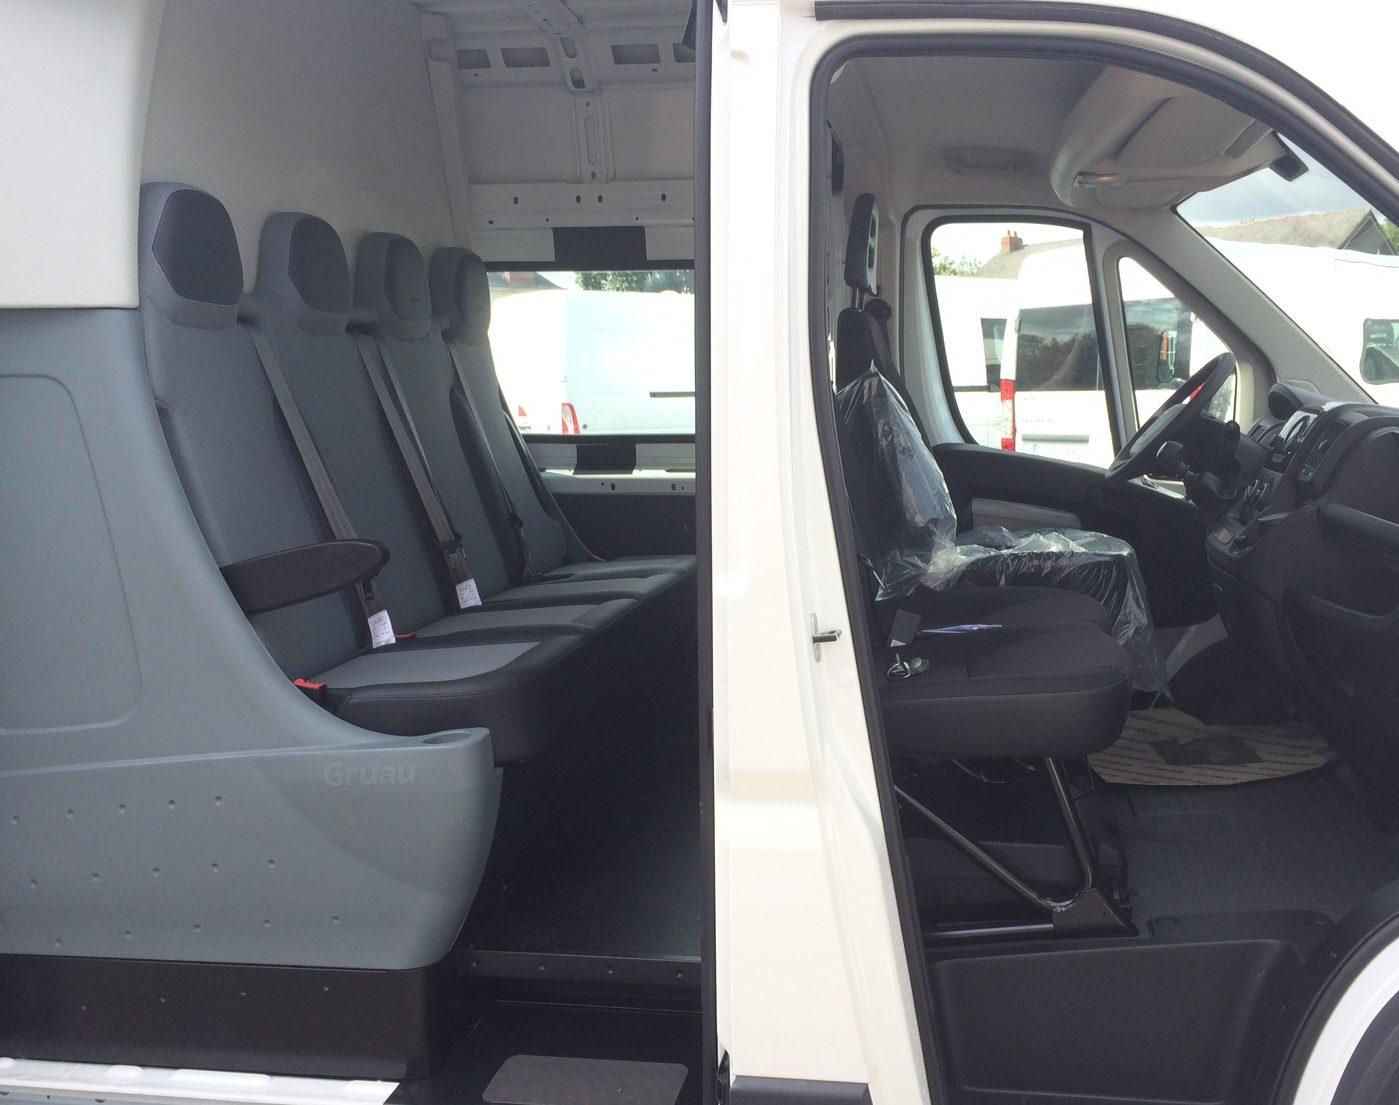 PEUGEOT BOXER 435 L4H2 2.2 HDI 150 PACK CLIM CAB APPRO 3